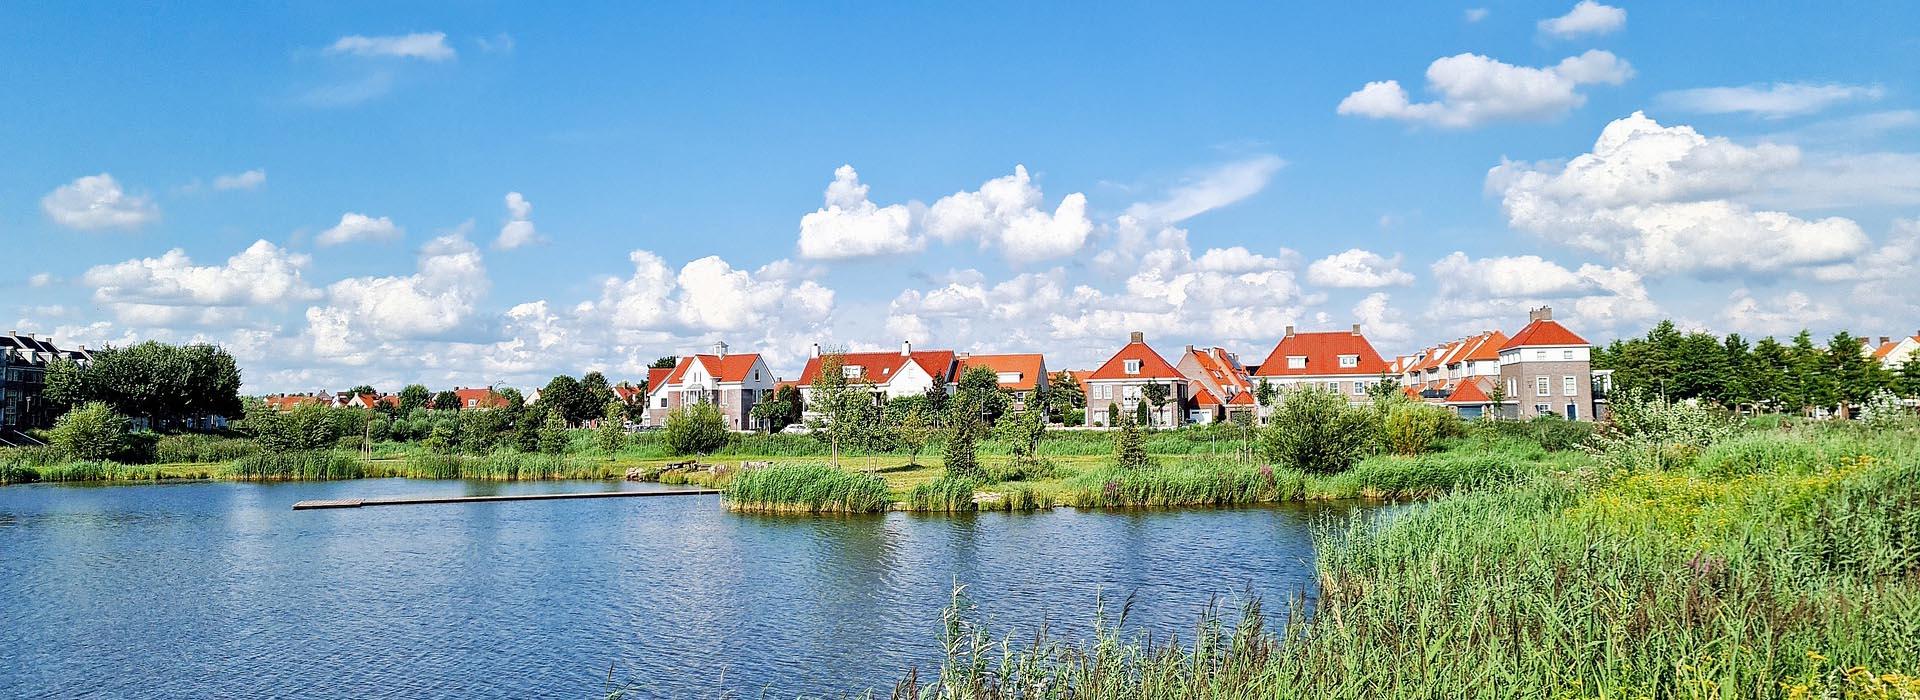 mansions beside lake in helmond